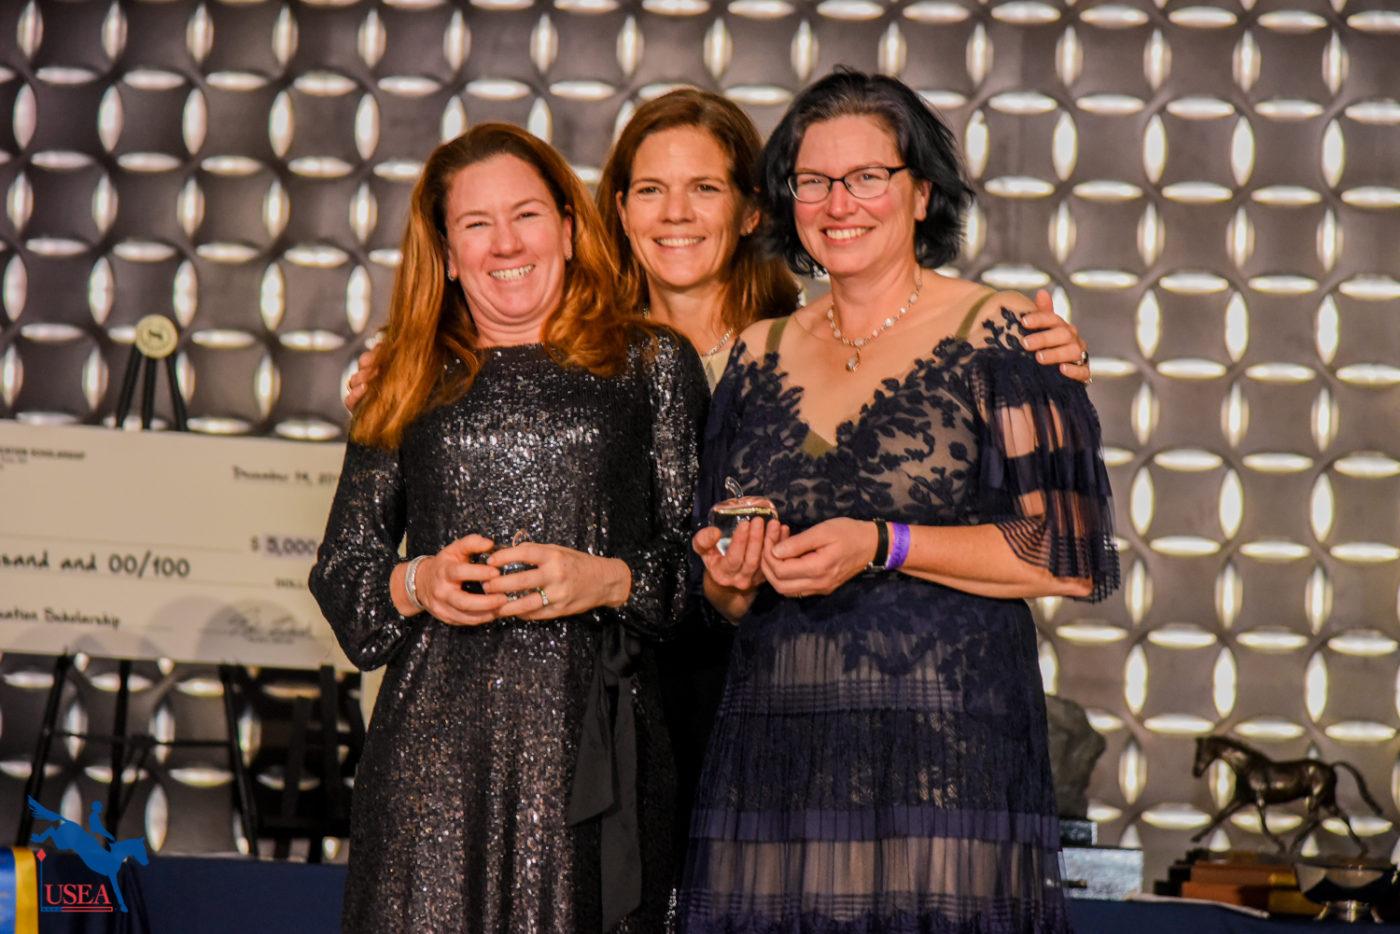 Mia Fox and Sport Tracker. USEA/Jessica Duffy Photo.